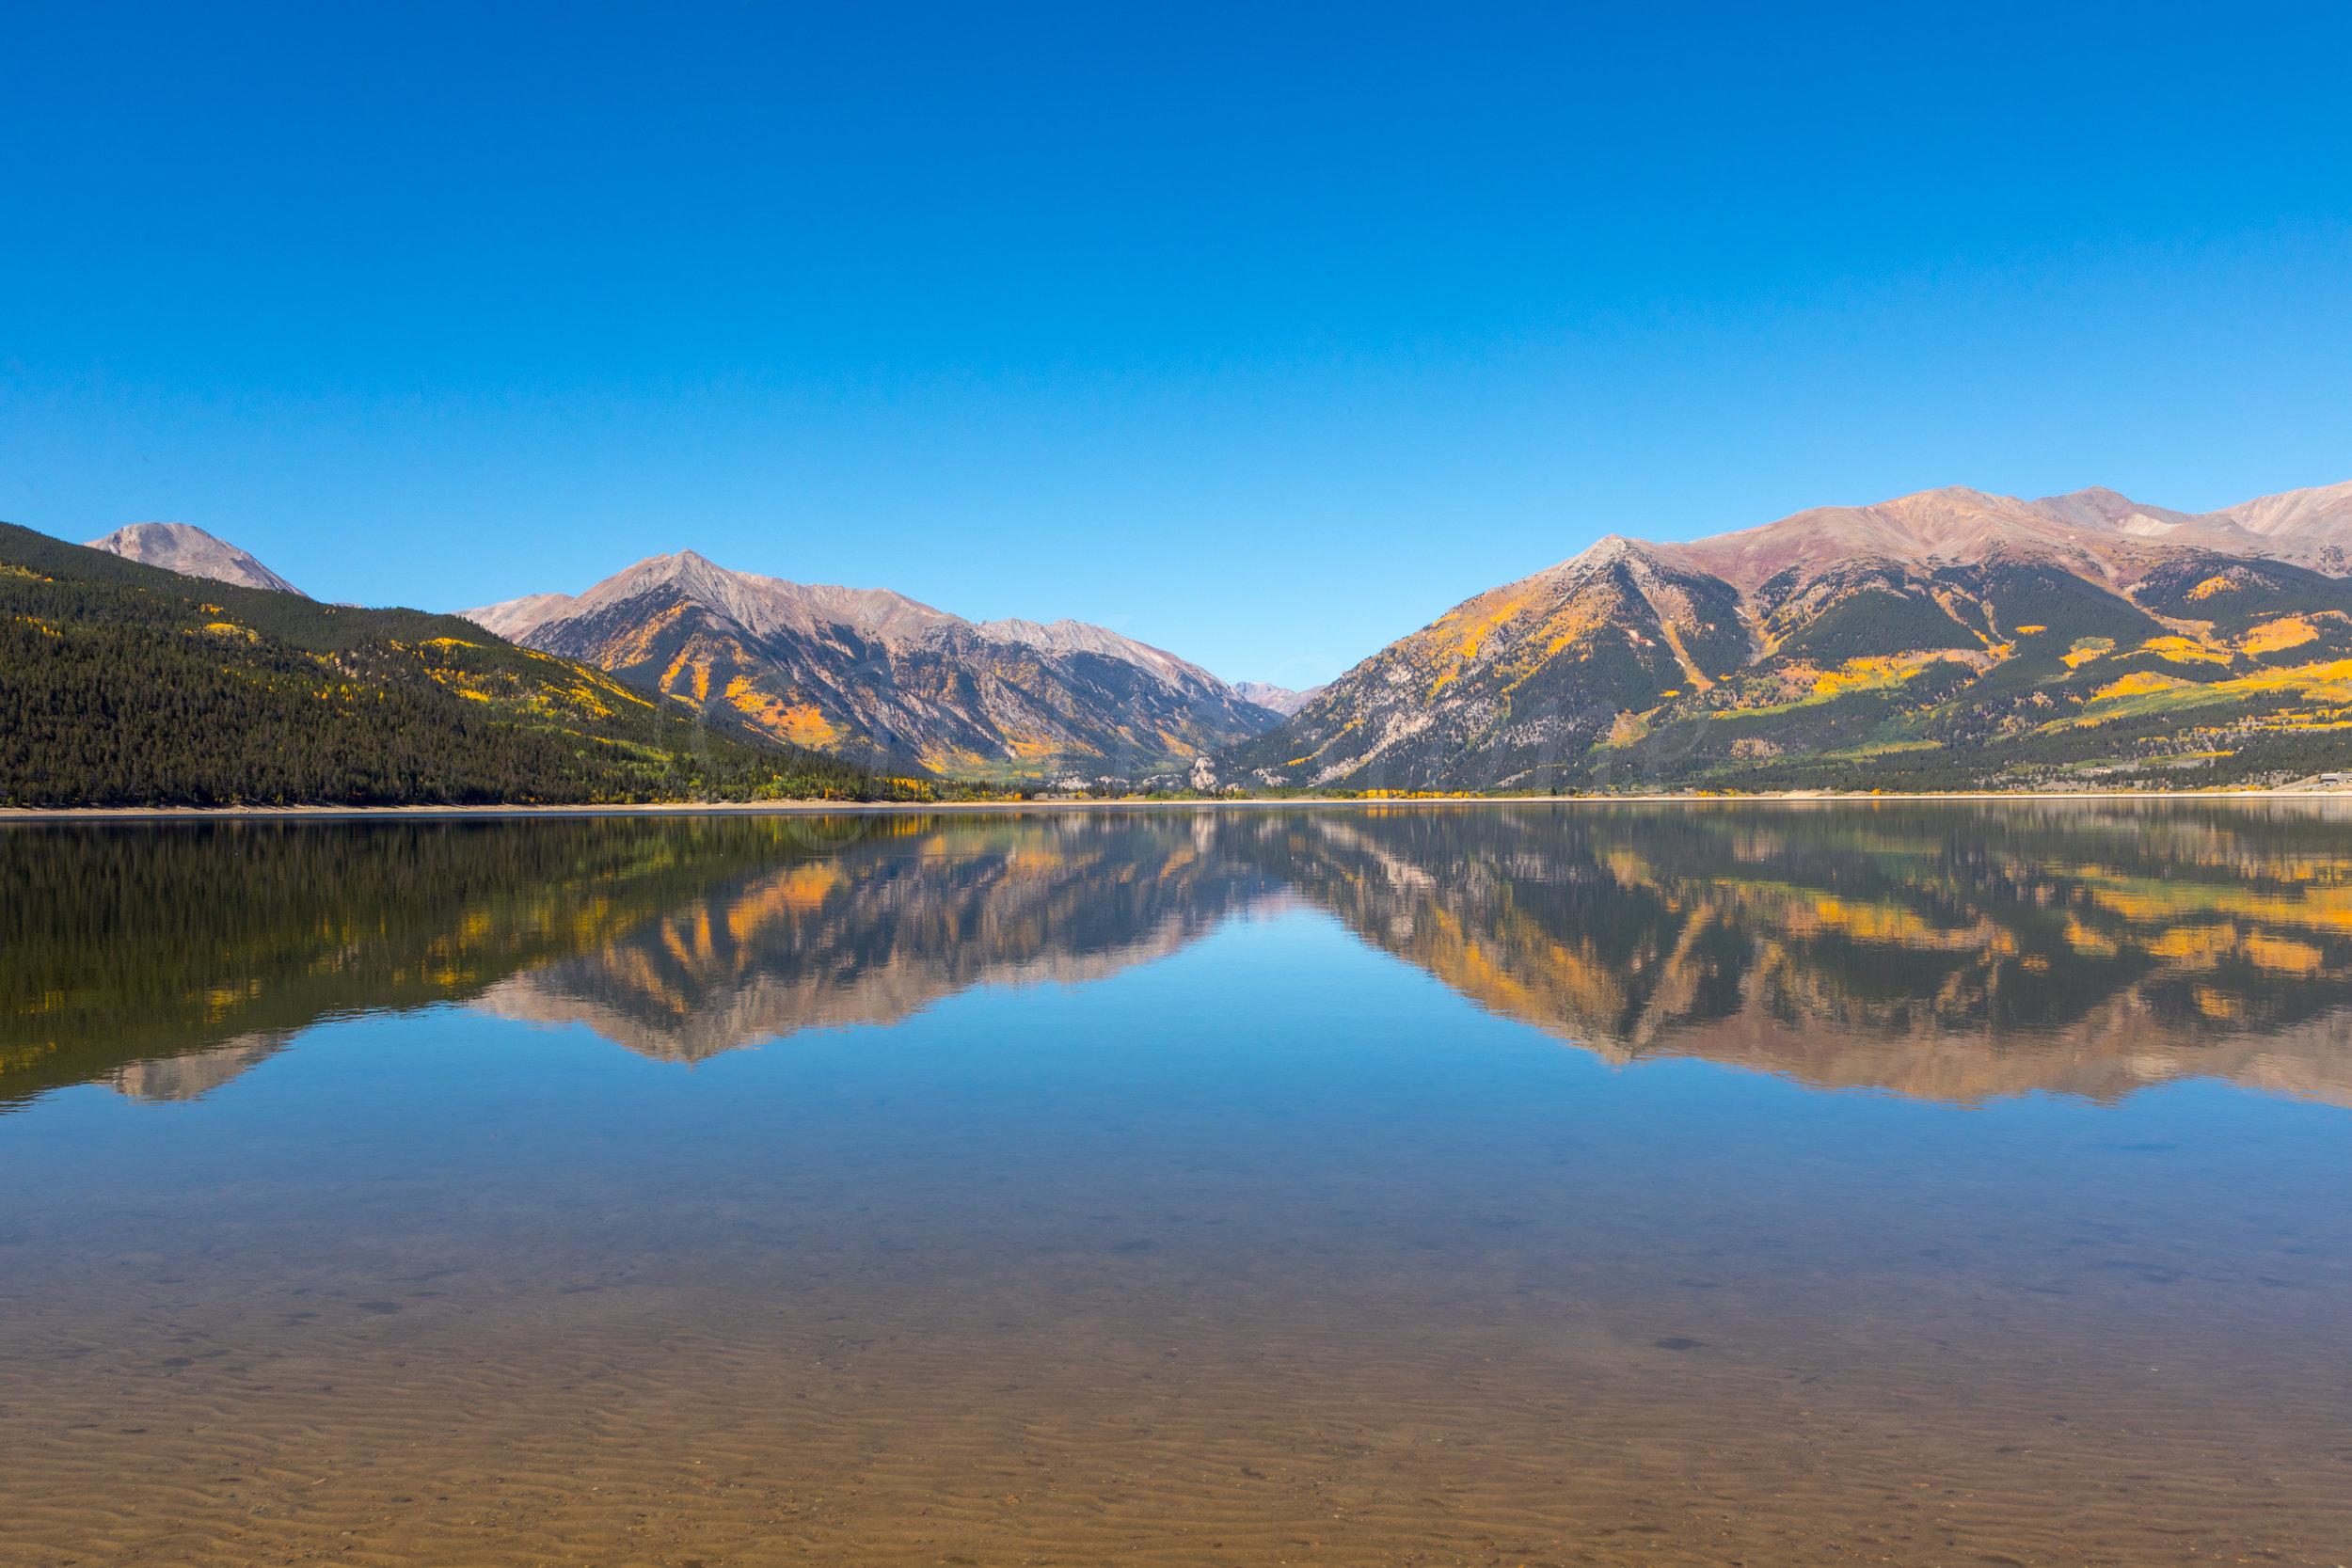 Twin Lakes, Image # 0430